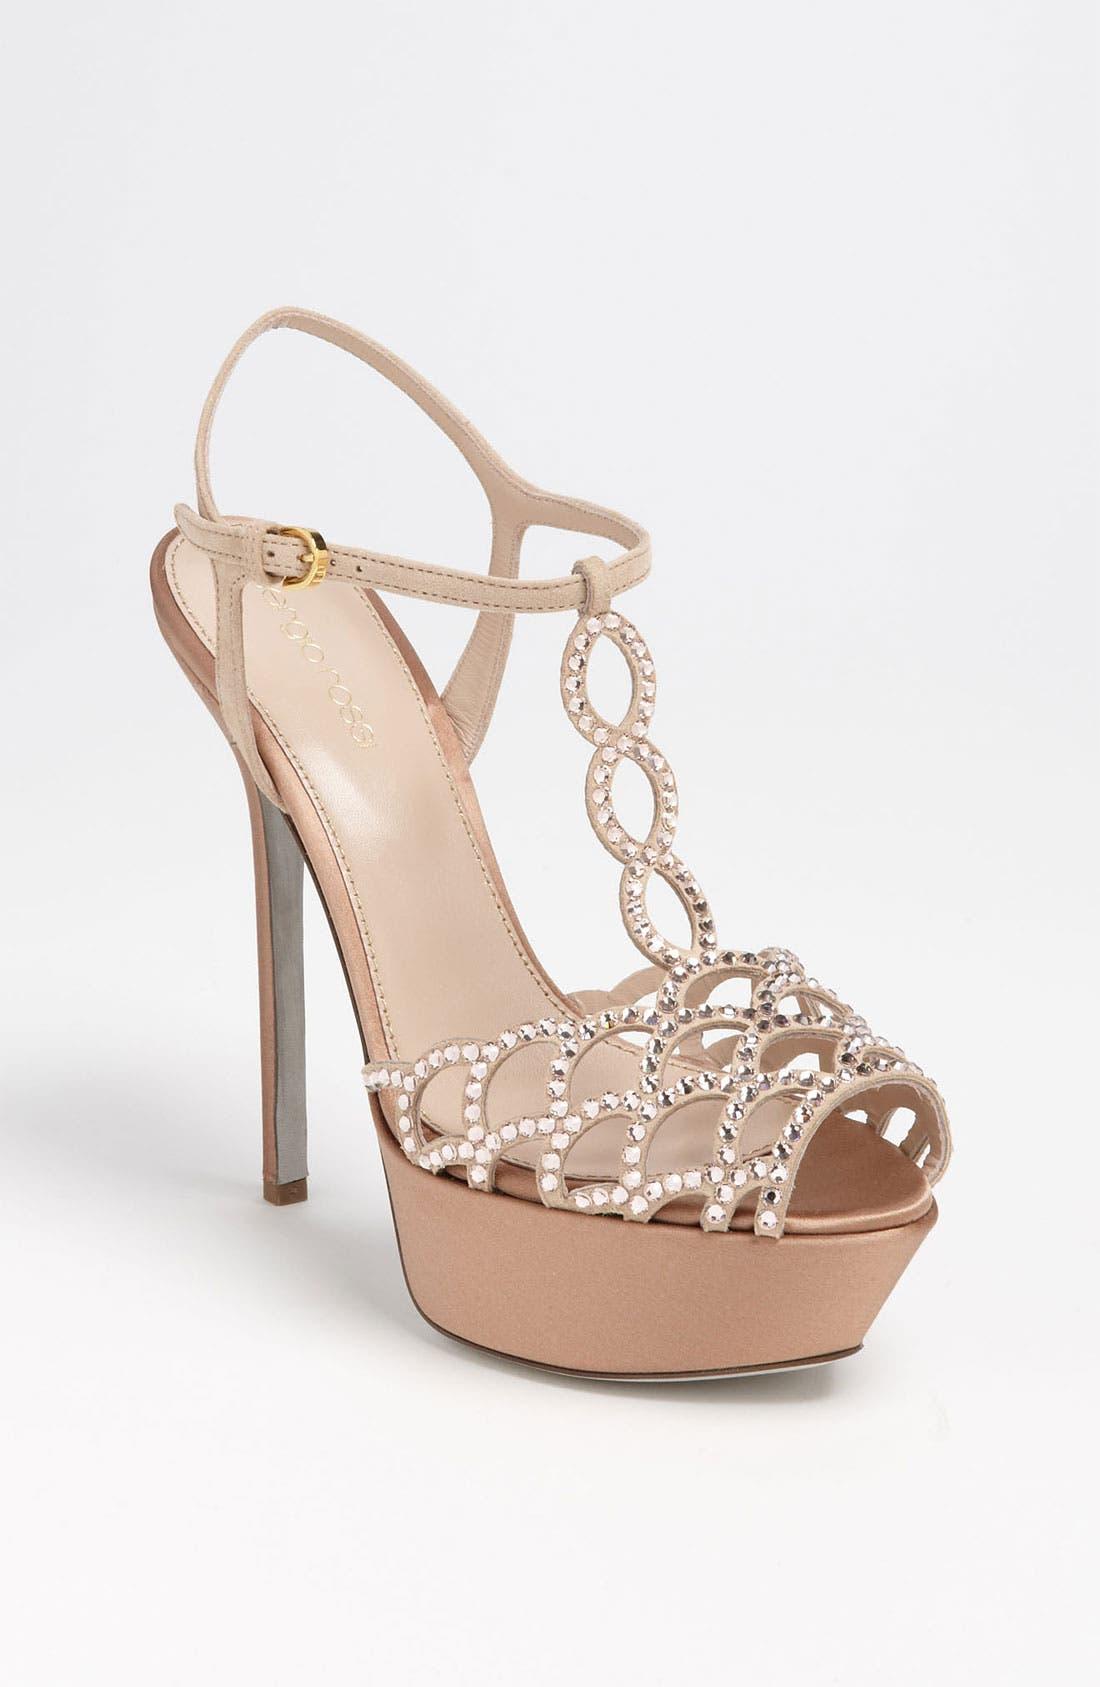 Alternate Image 1 Selected - Sergio Rossi 'Crystal Vague' Platform Sandal